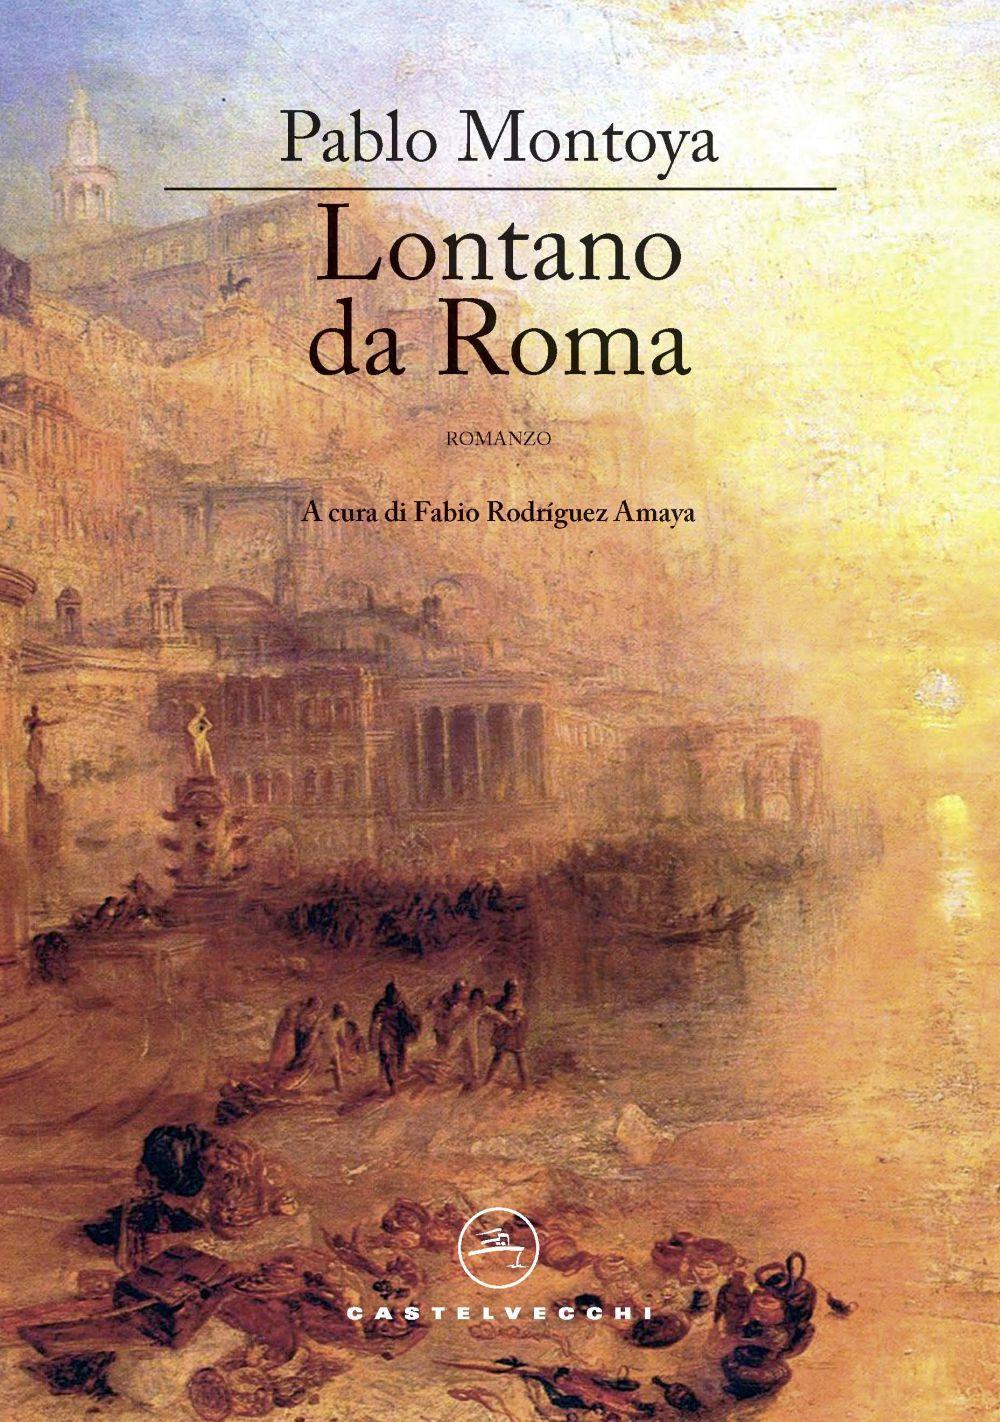 LONTANO DA ROMA - Montoya Pablo - 9788832828818